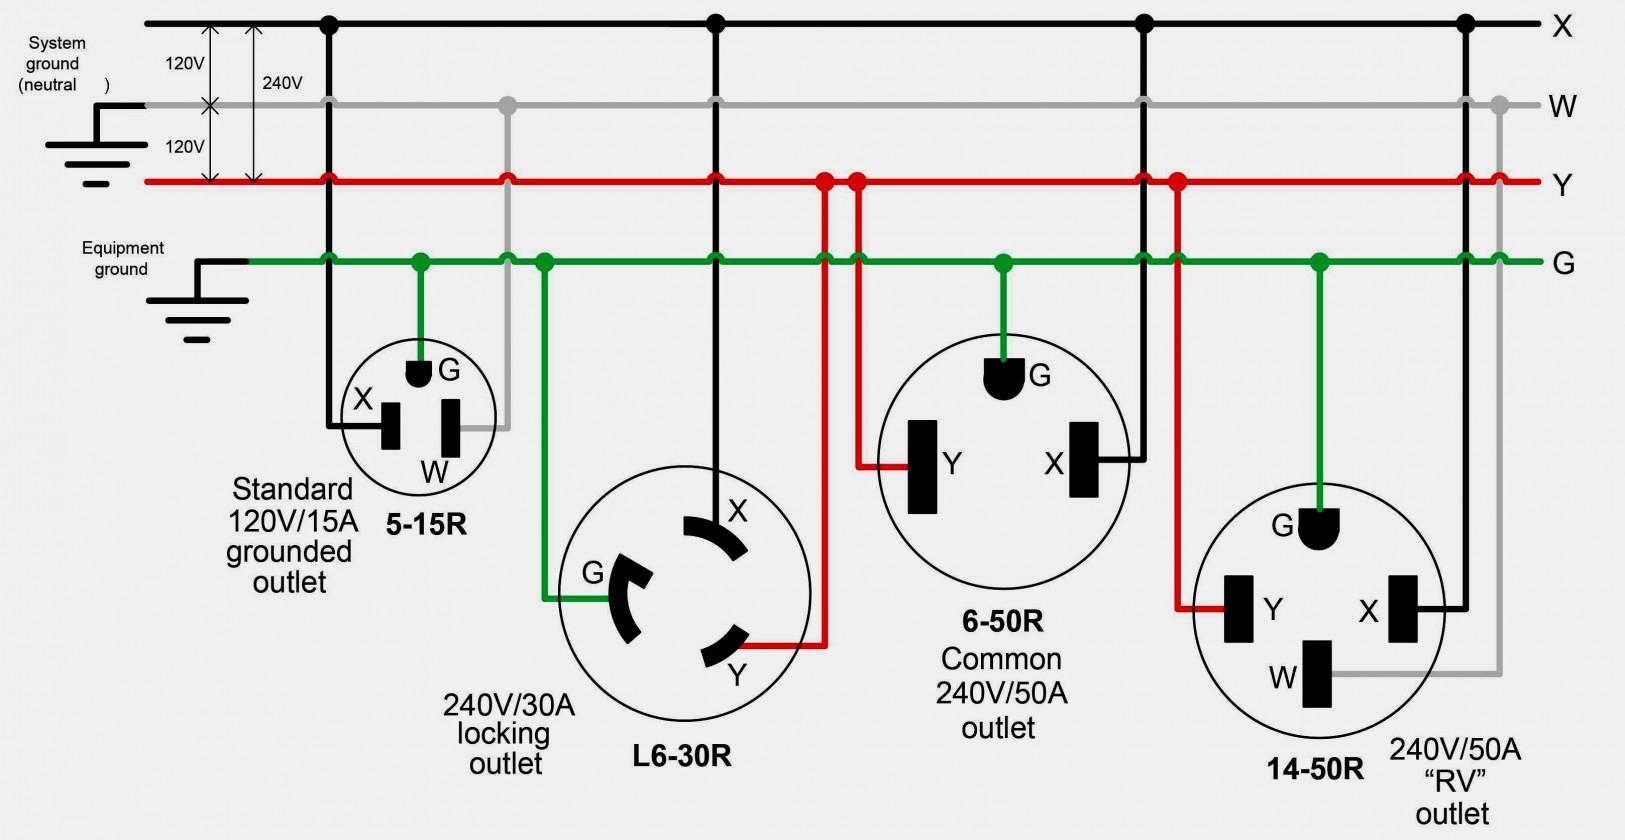 20 Amp Twist Lock Wiring Diagram | Manual E-Books - 20 Amp Twist Lock Plug Wiring Diagram